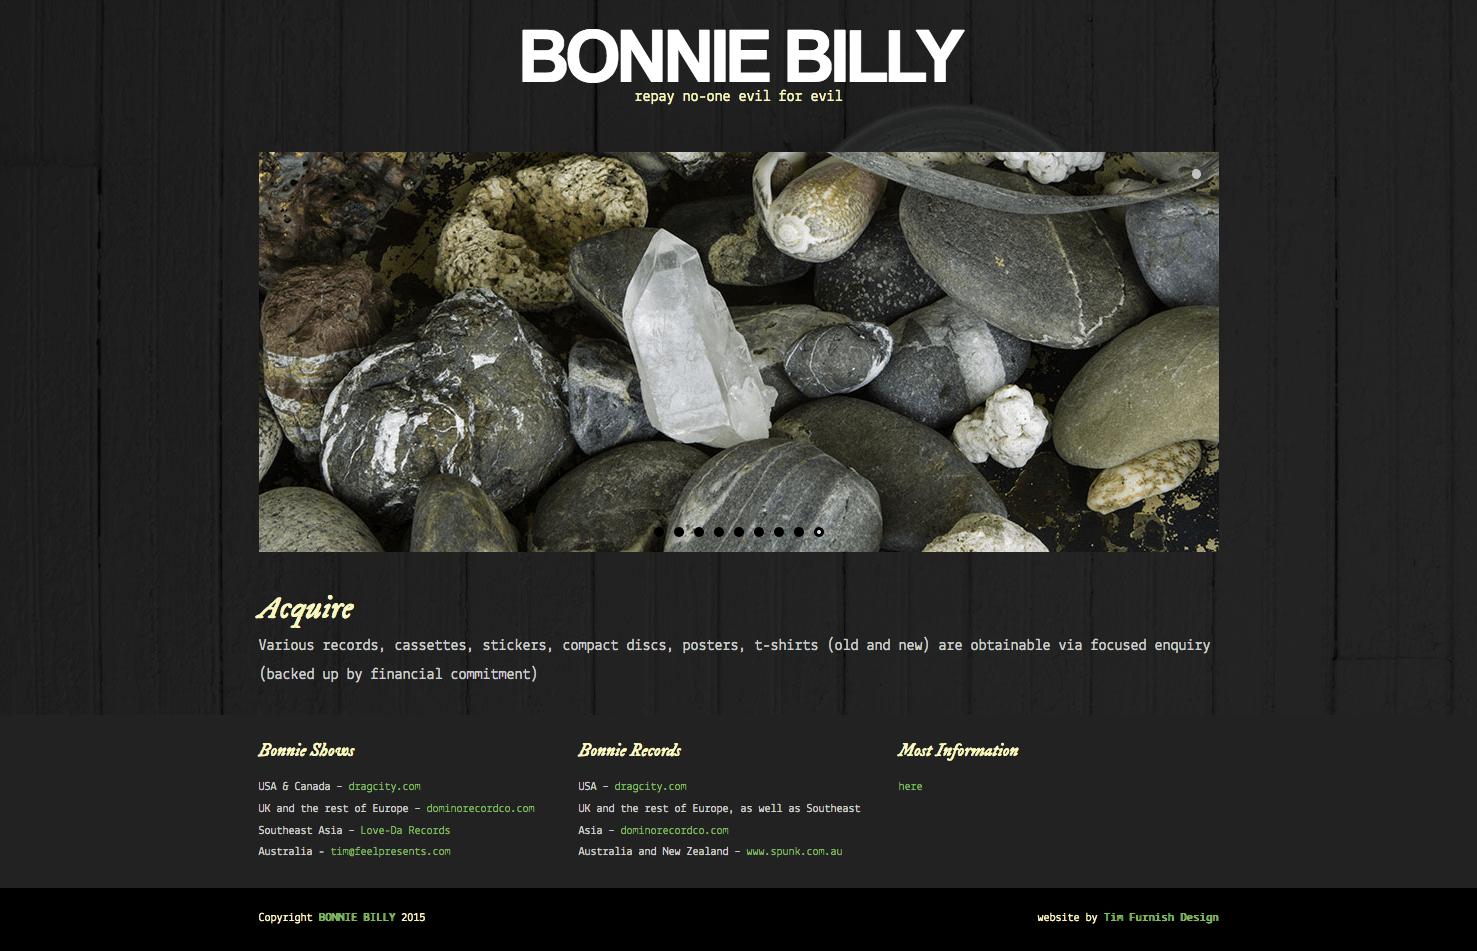 Bonnie Prince Billy web site